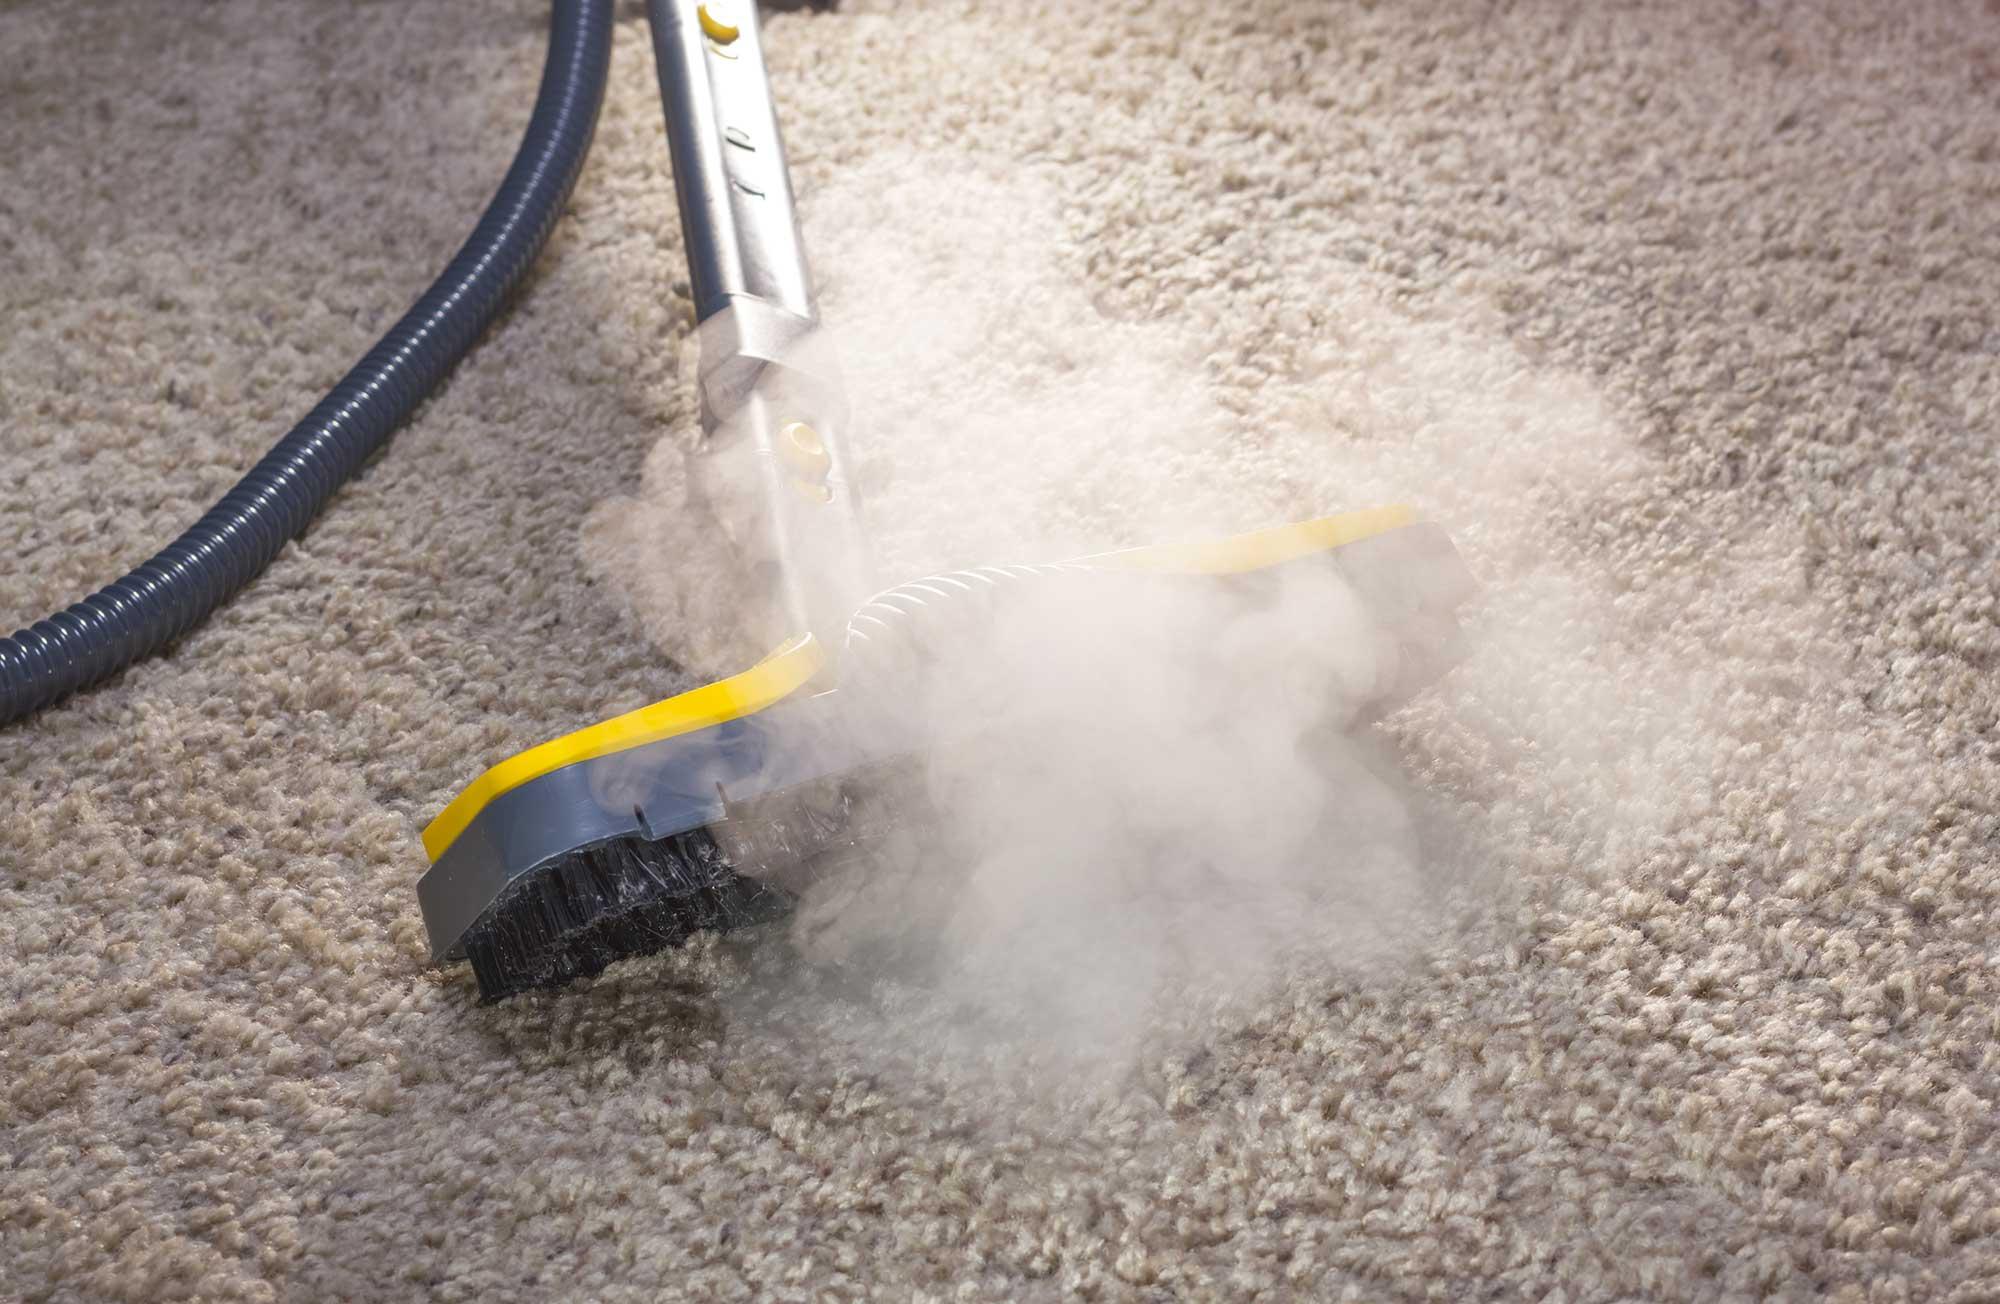 Steam carpet cleaning in Tucson, AZ